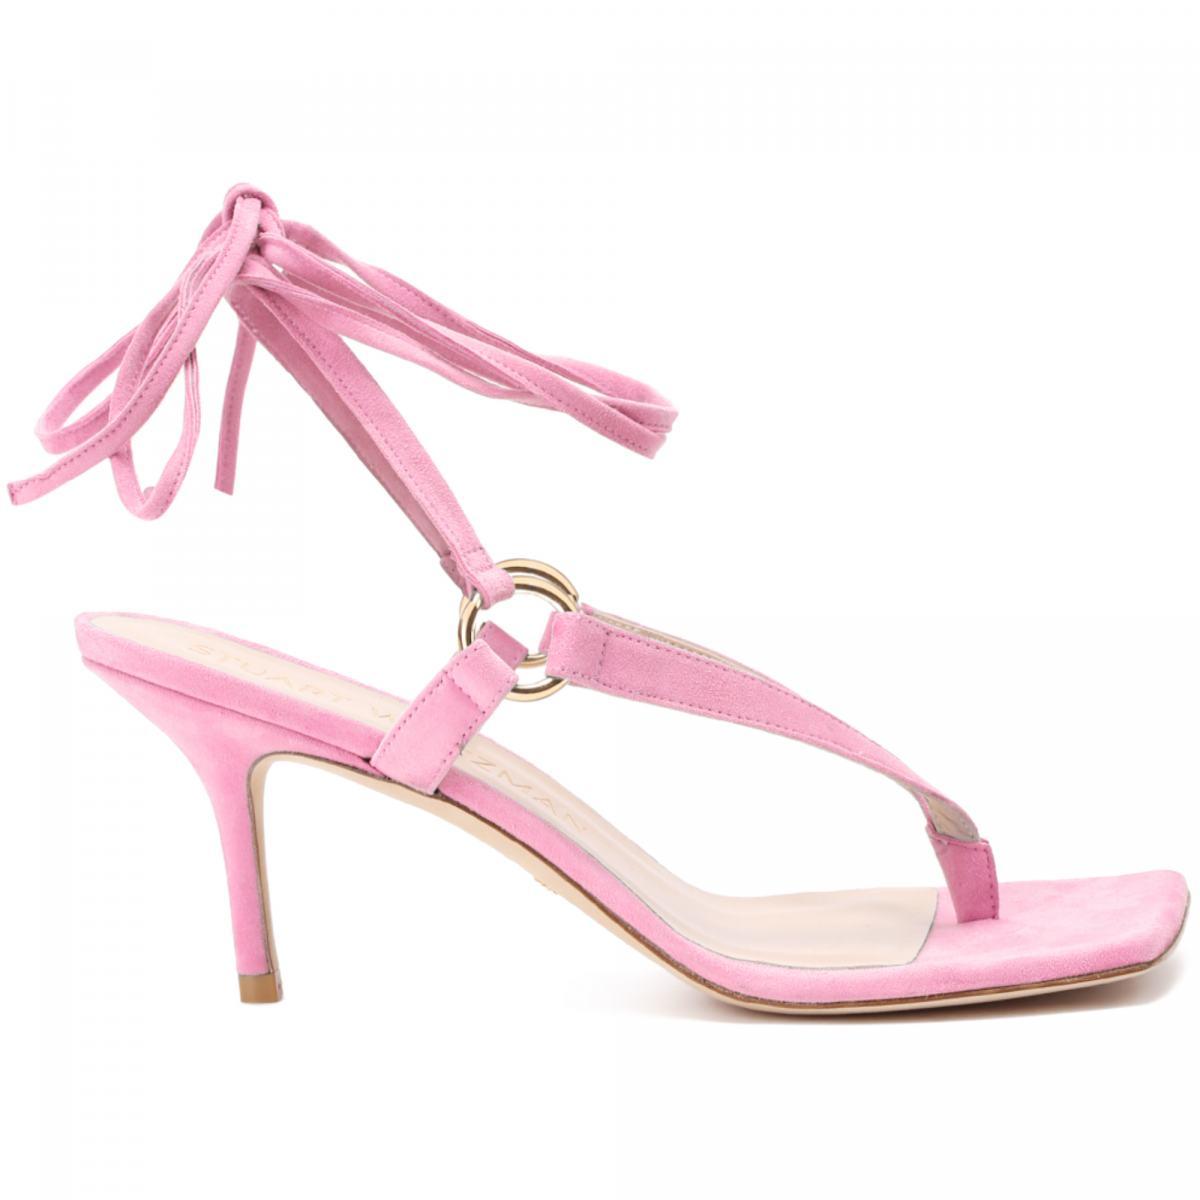 Stuart Weitzman Ladies Platinum 65 Sandals - Shoes - Jomashop